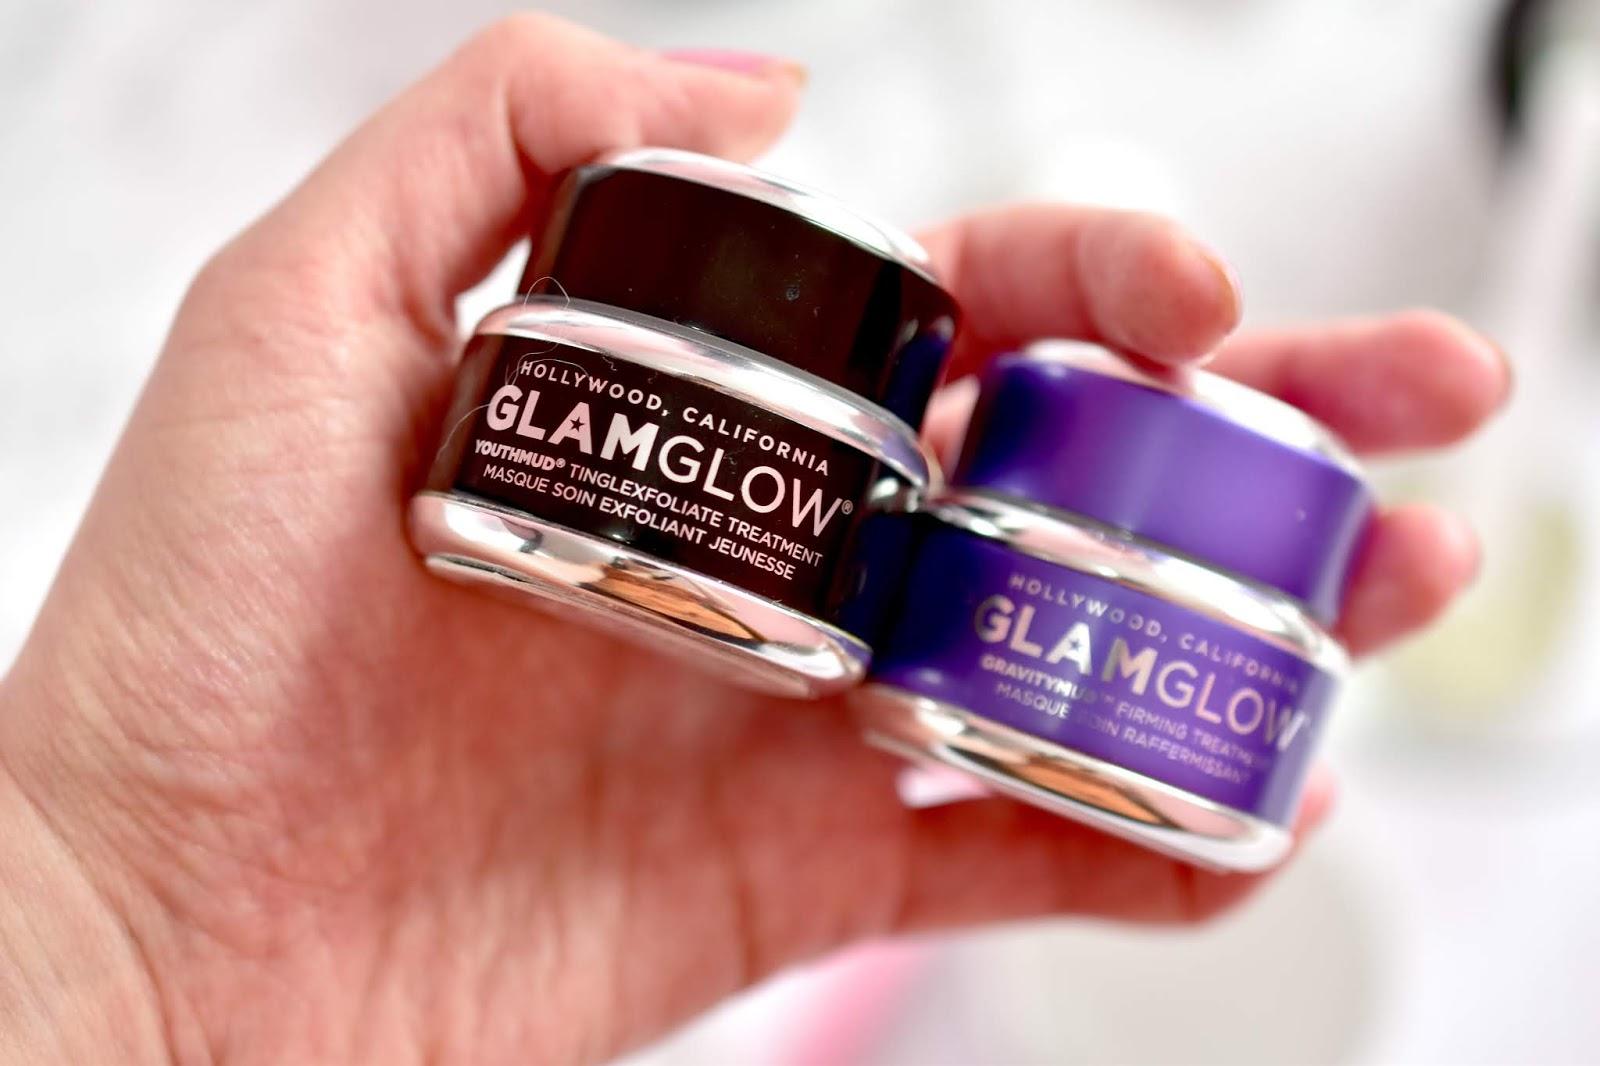 Glam Glow masky